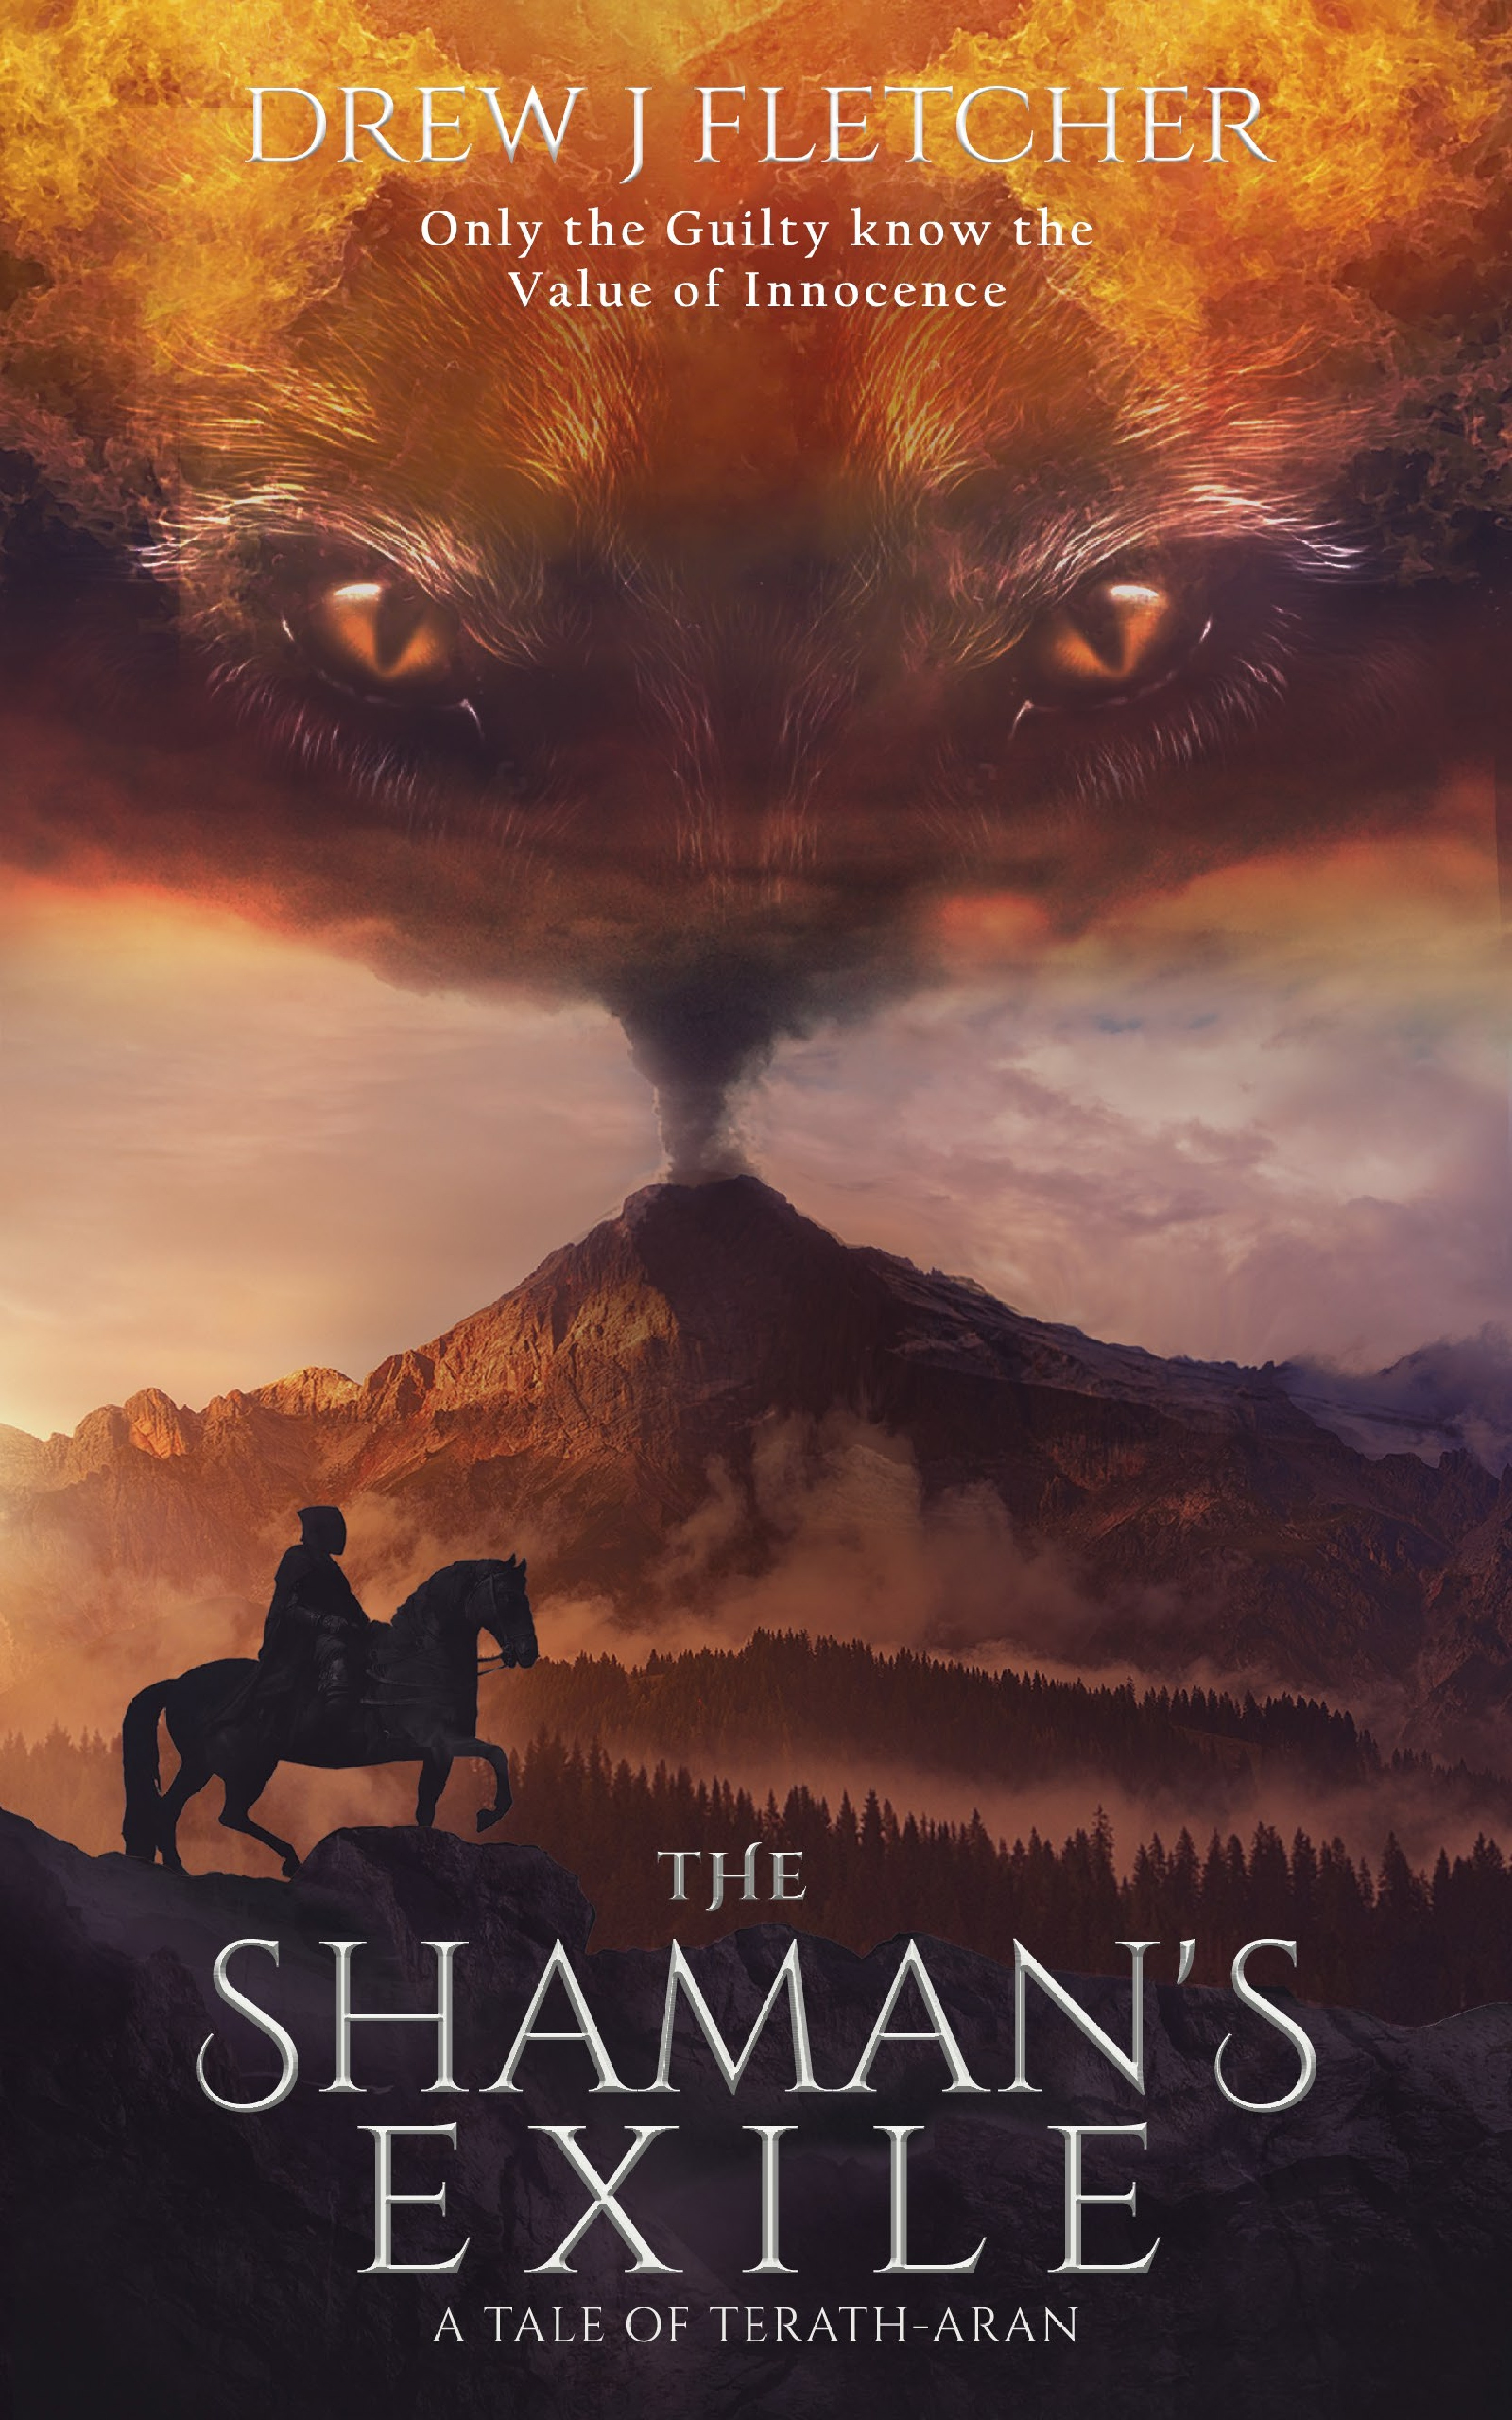 Design the cover for a debut Fantasy eBook